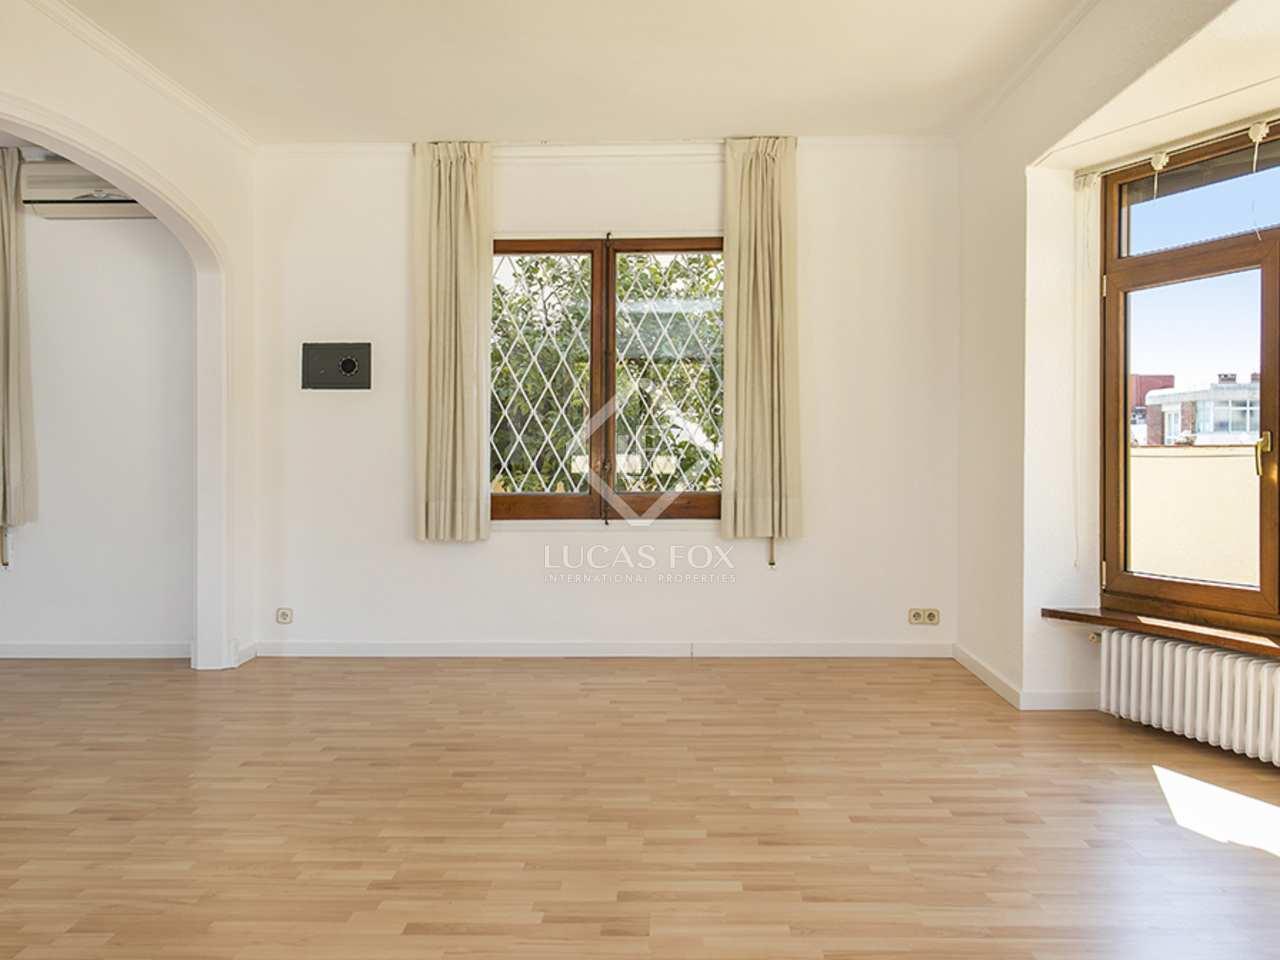 Casa de 336 m² con terraza en alquiler en Sant Gervasi